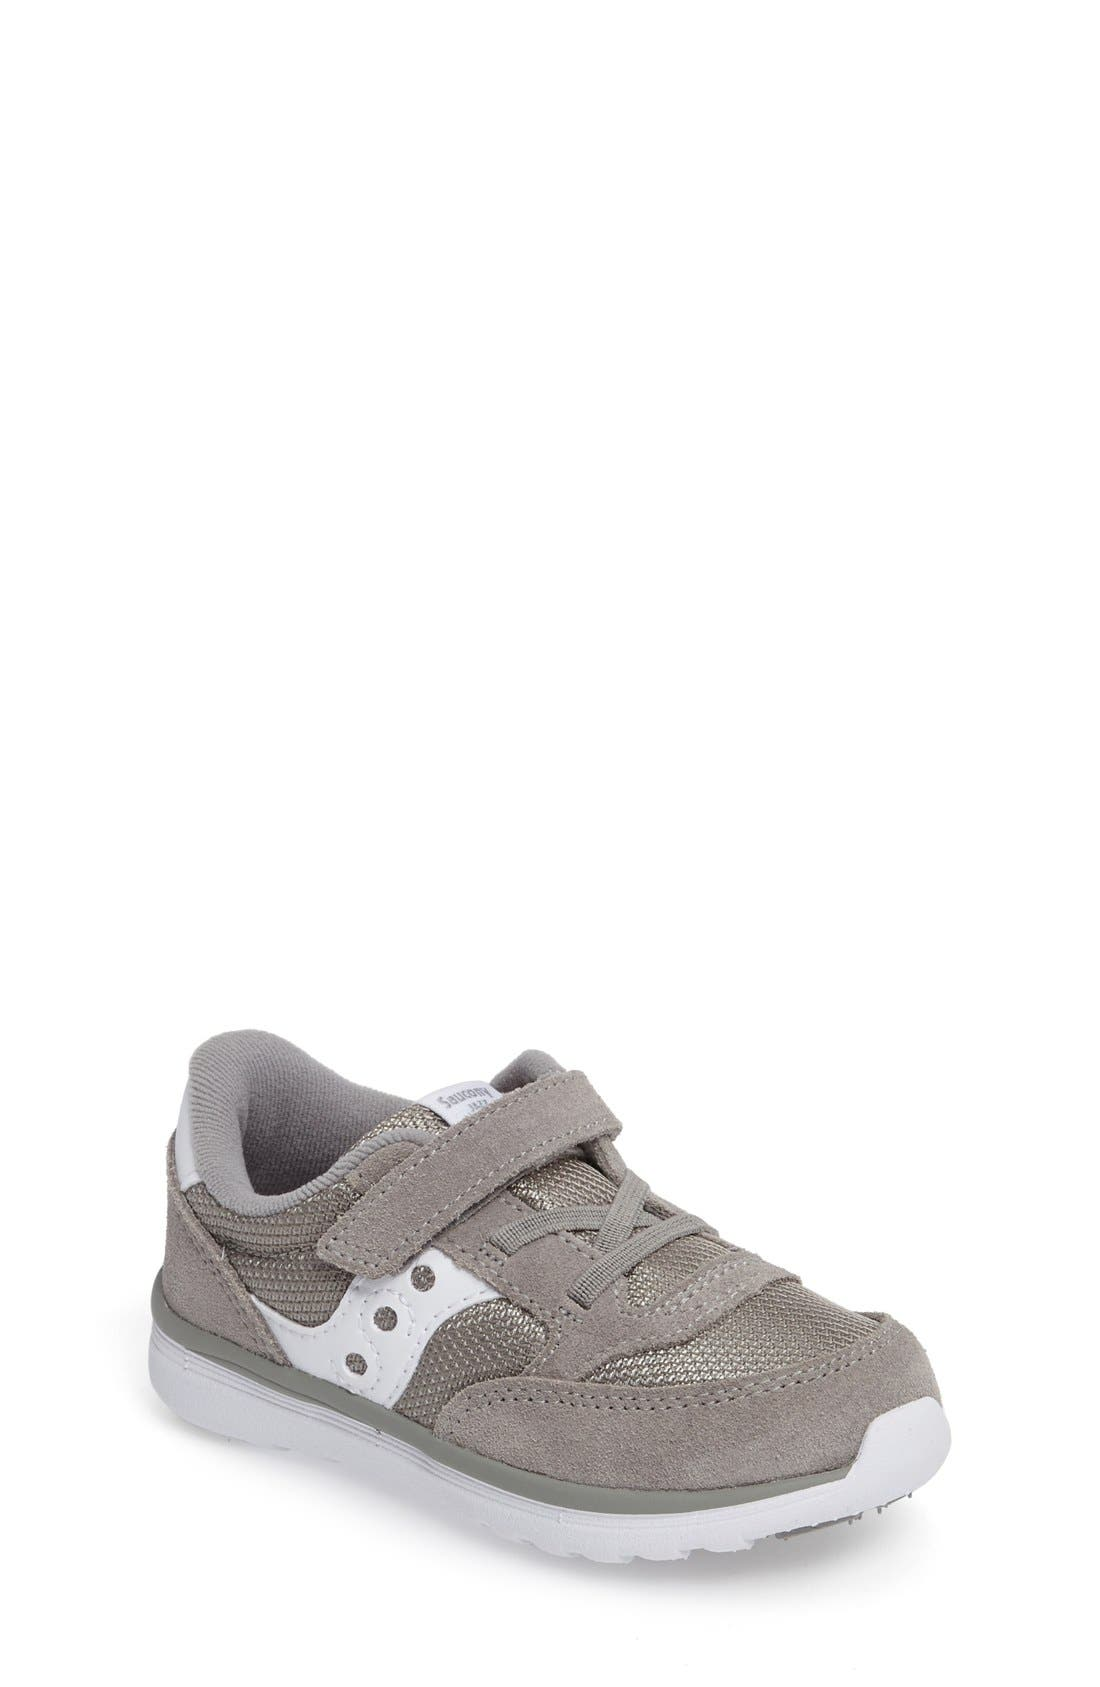 Jazz Lite Sneaker,                         Main,                         color, Grey/ White